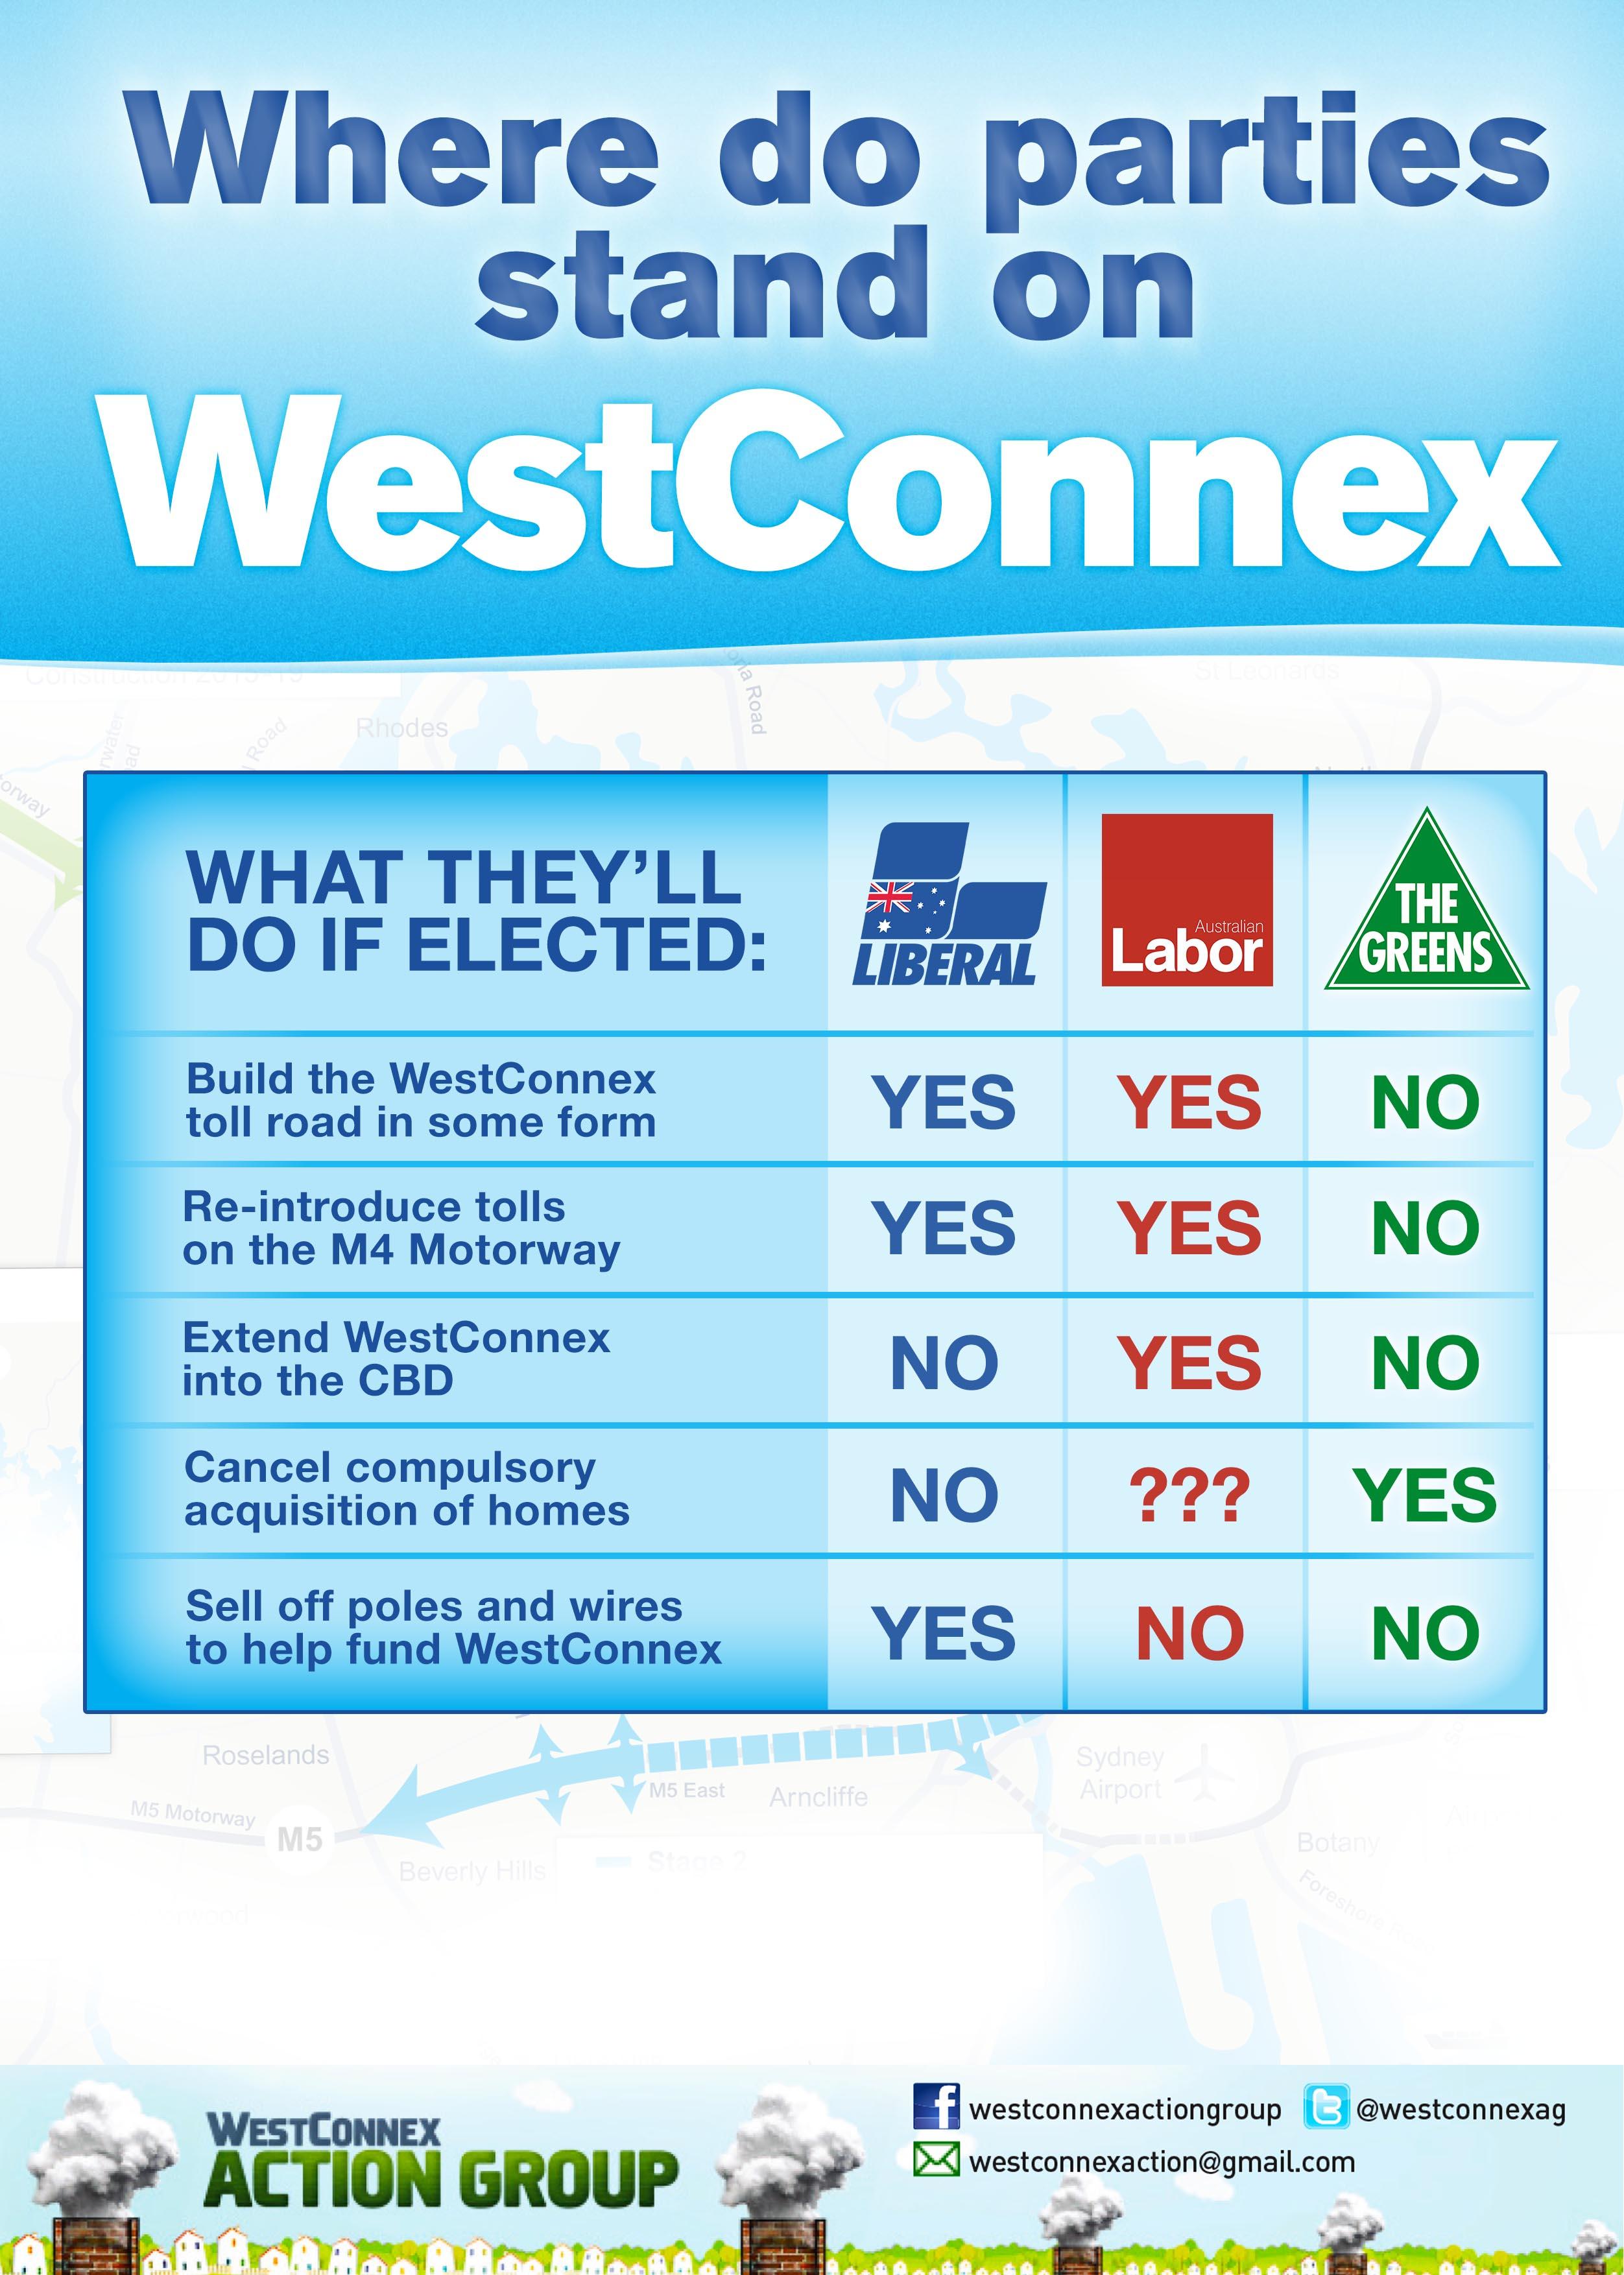 West_Connex_table_standalone_version-1.jpg